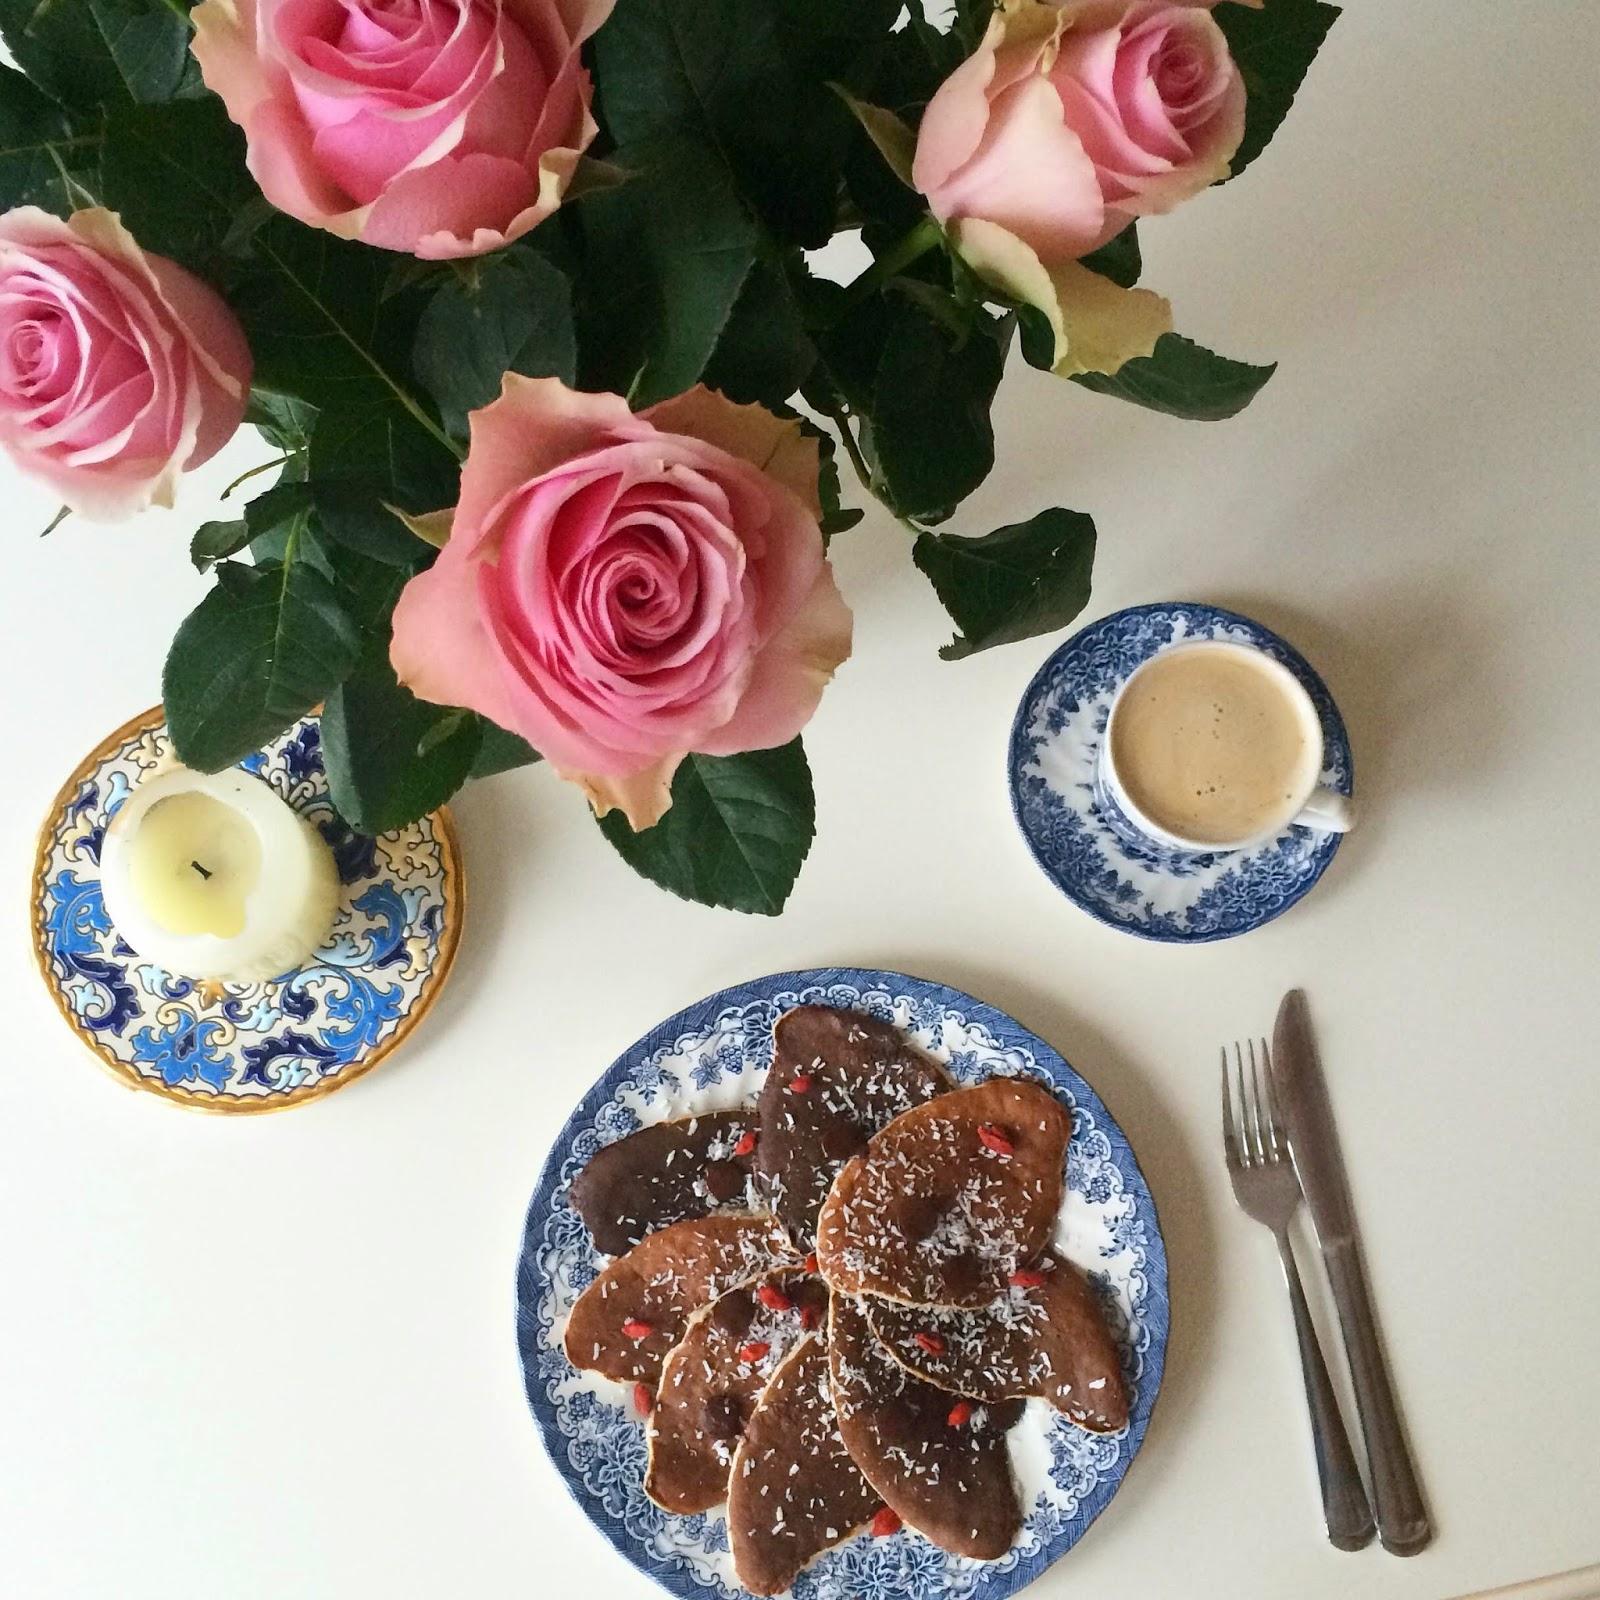 healthy-breakfast-banana-pancakes-pink-roses